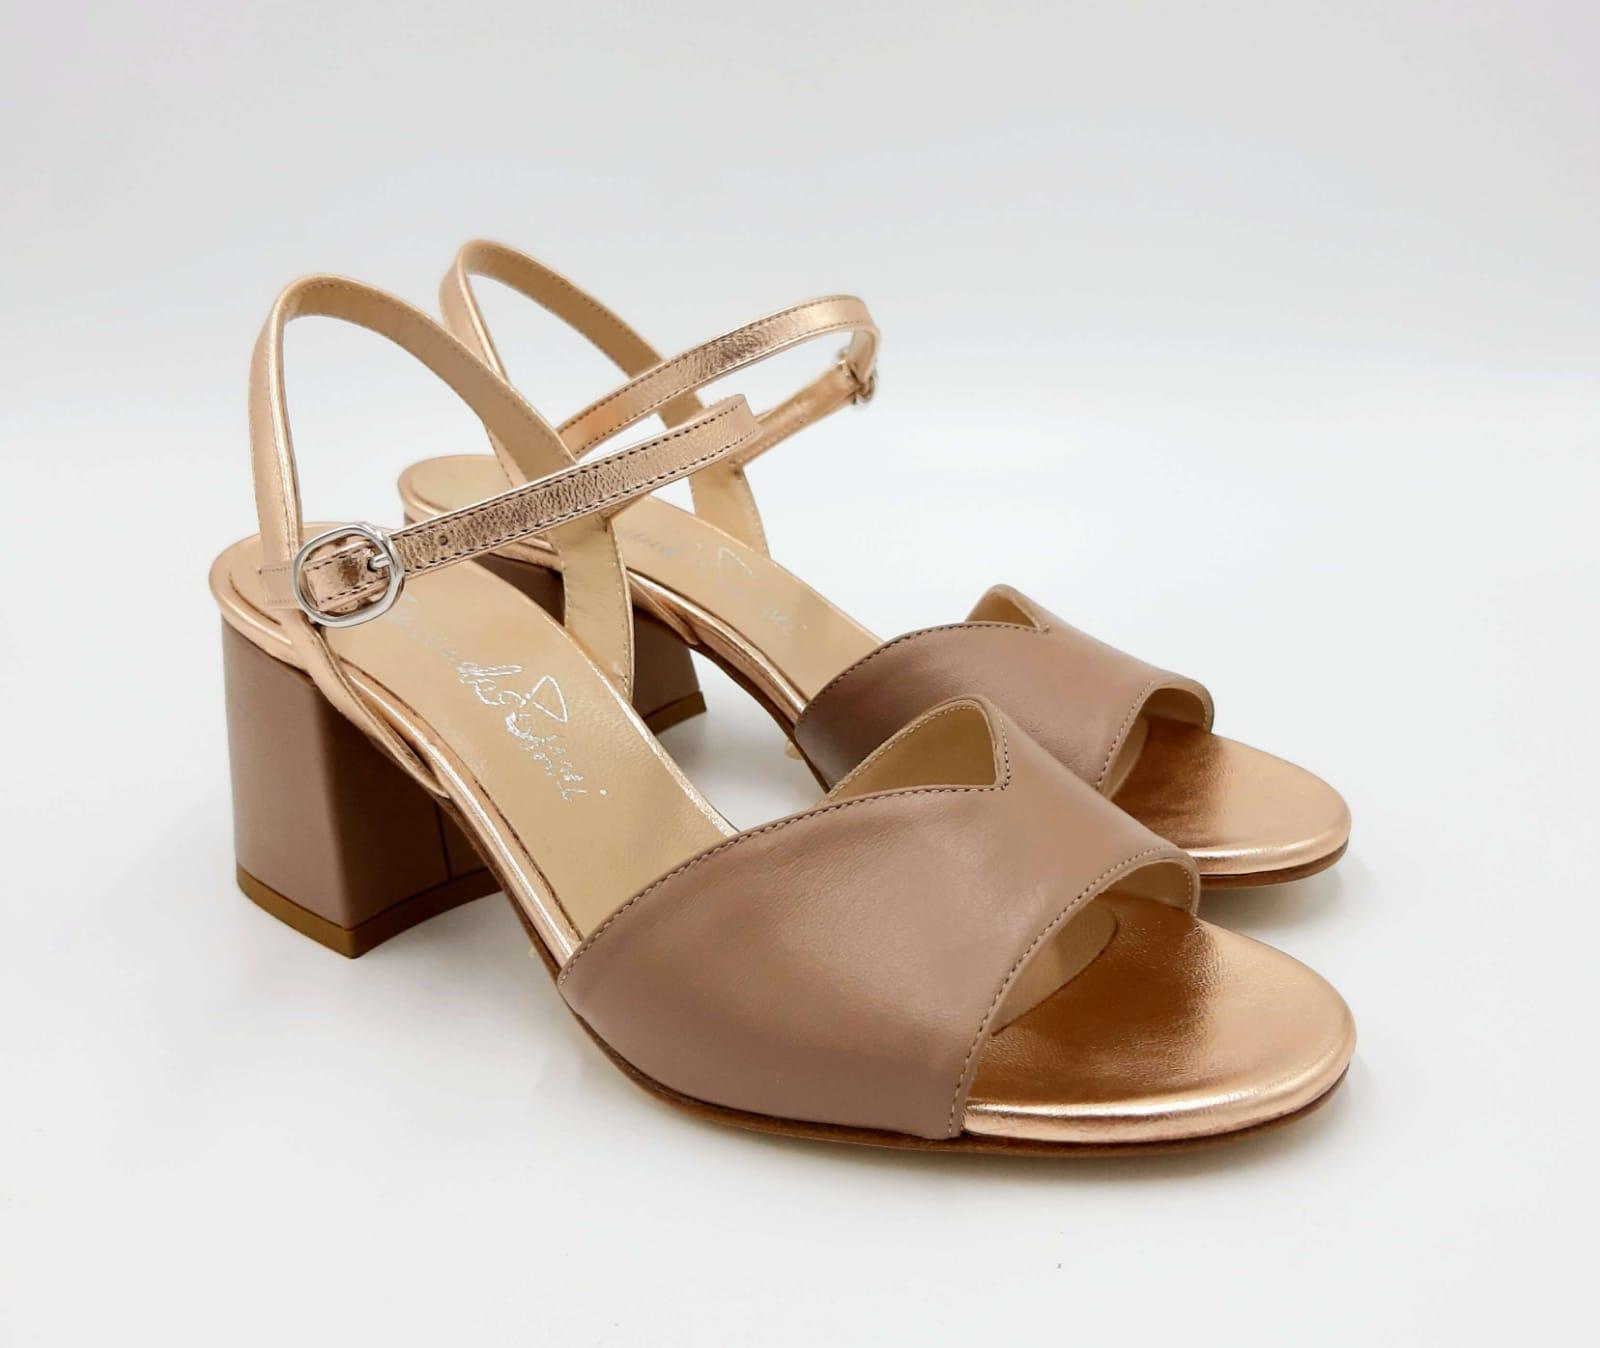 Sandalo in pelle nude tacco largo Emanuela Passeri